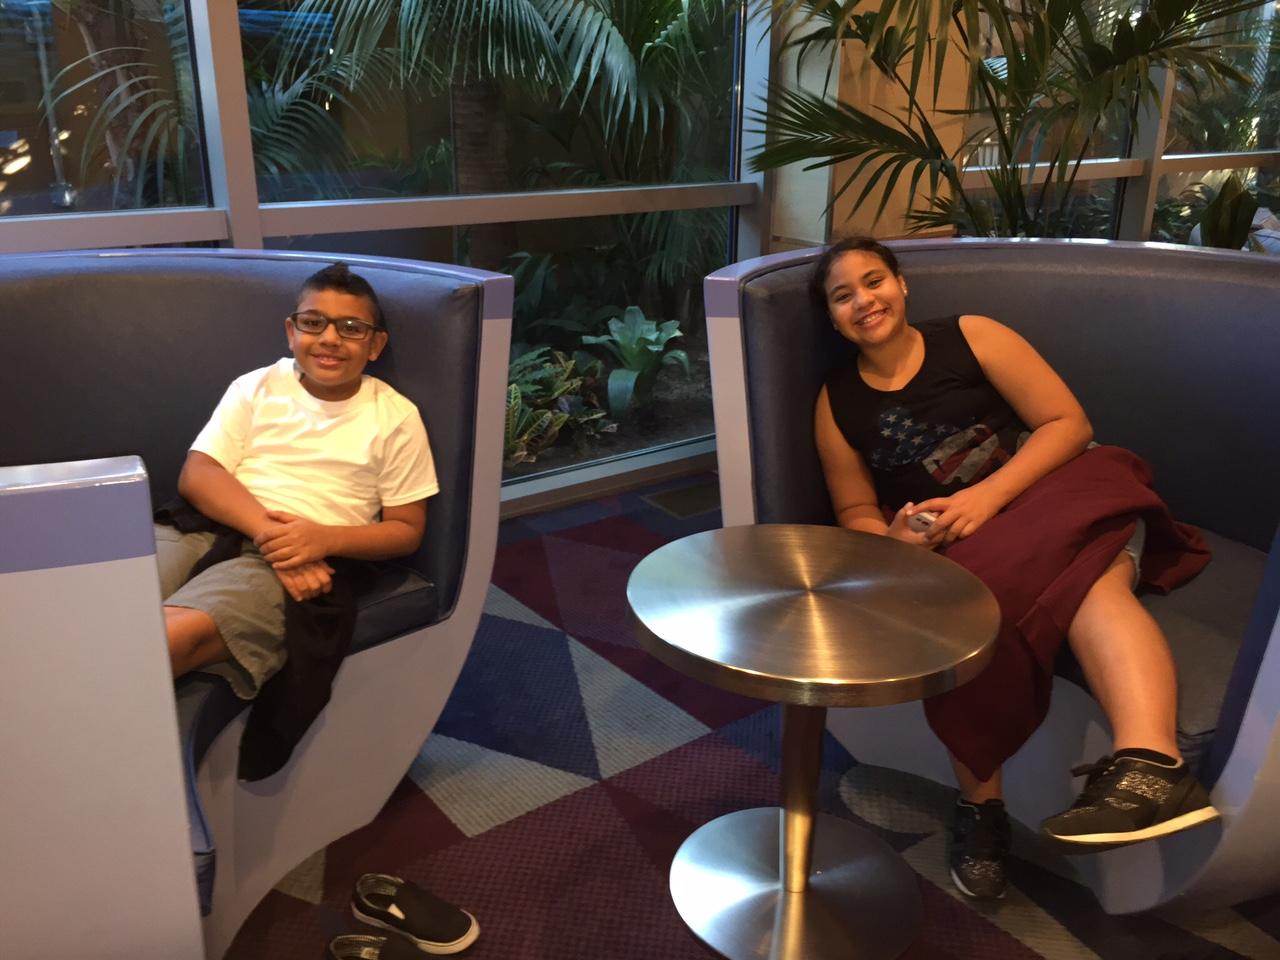 disneyland-hotel-review-lobby.jpg